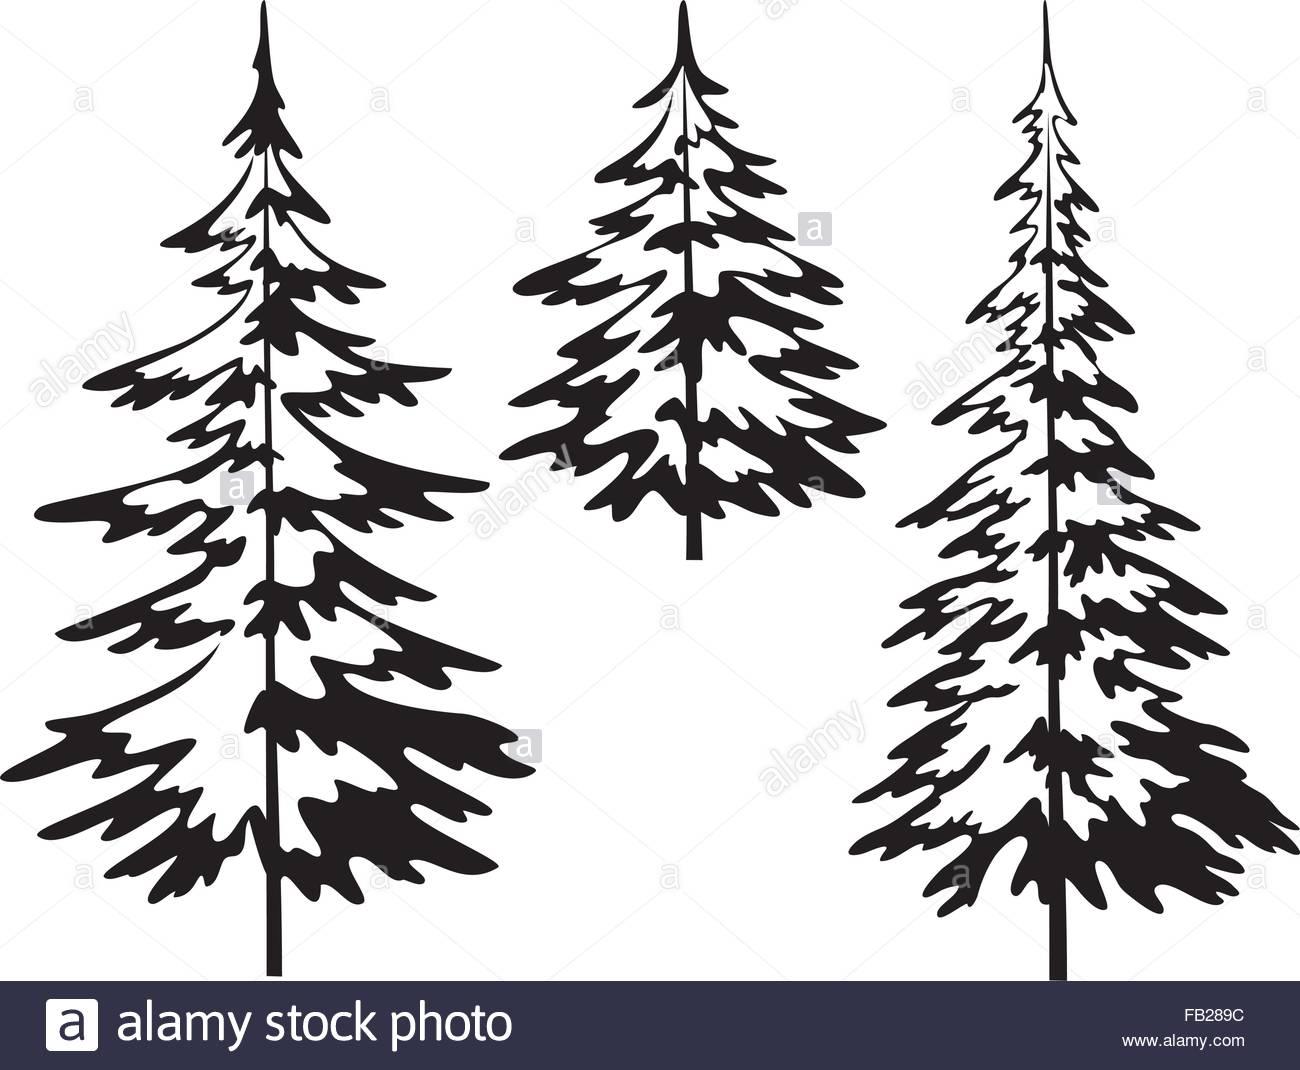 1300x1070 Christmas Fir Tree, Contours Stock Vector Art Amp Illustration